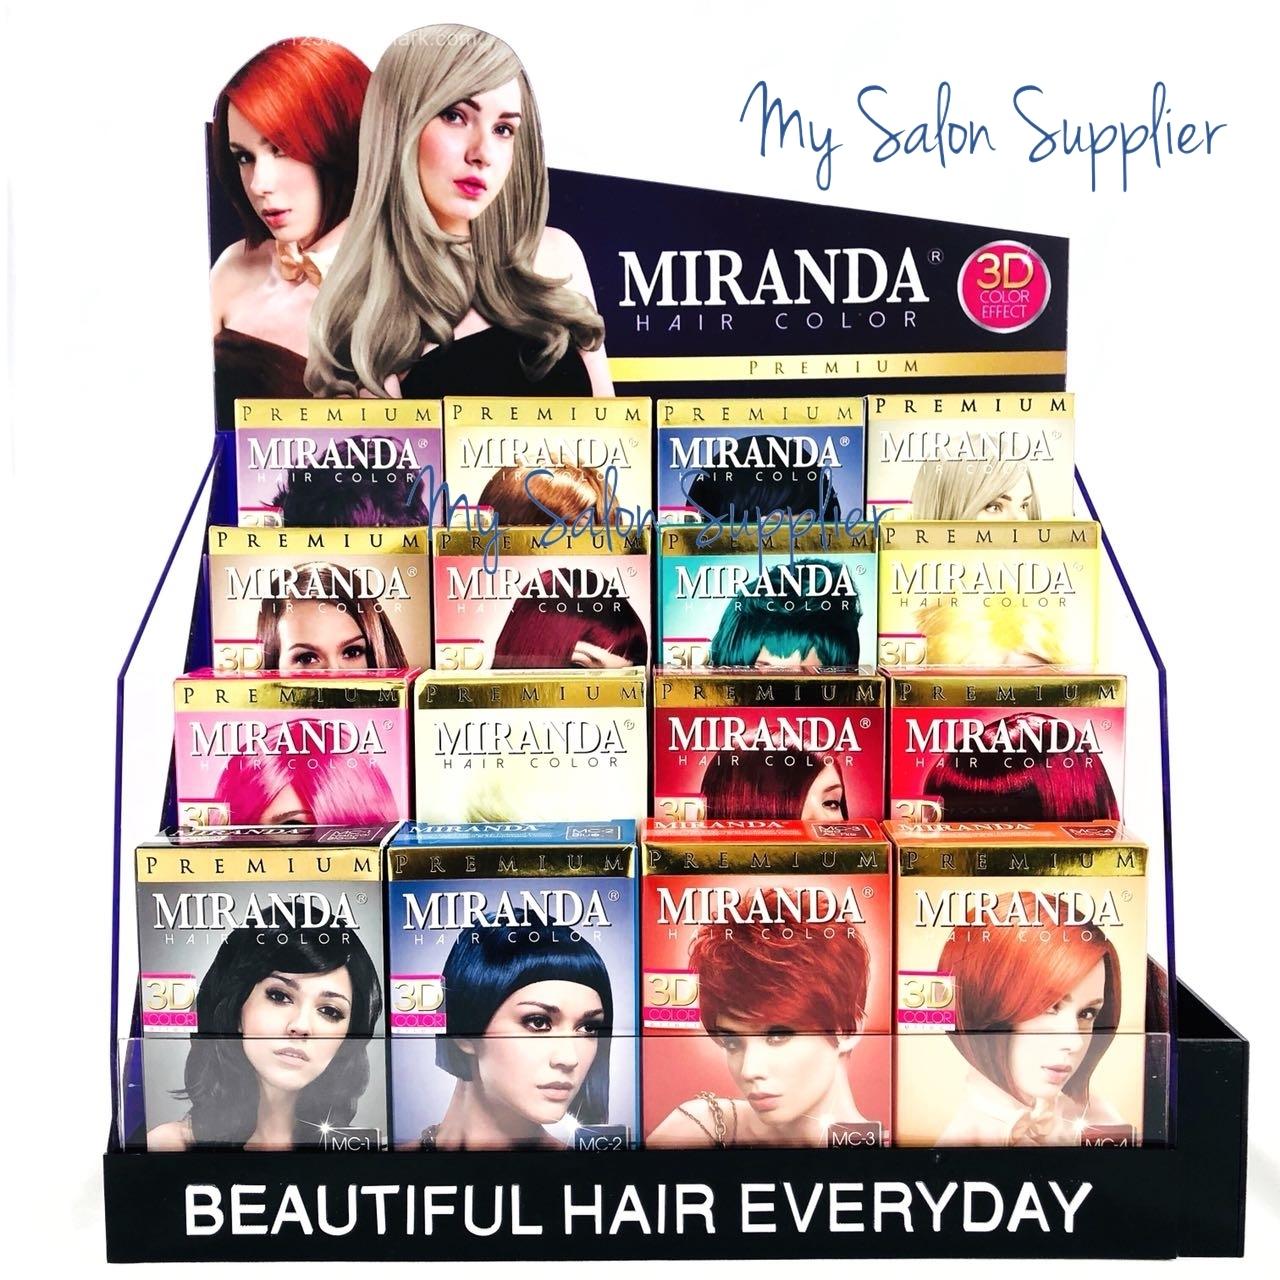 Jual Miranda Hair Color KECIL   Cat Rambut   Bleaching KECIL - My ... 5ce79bdc3e